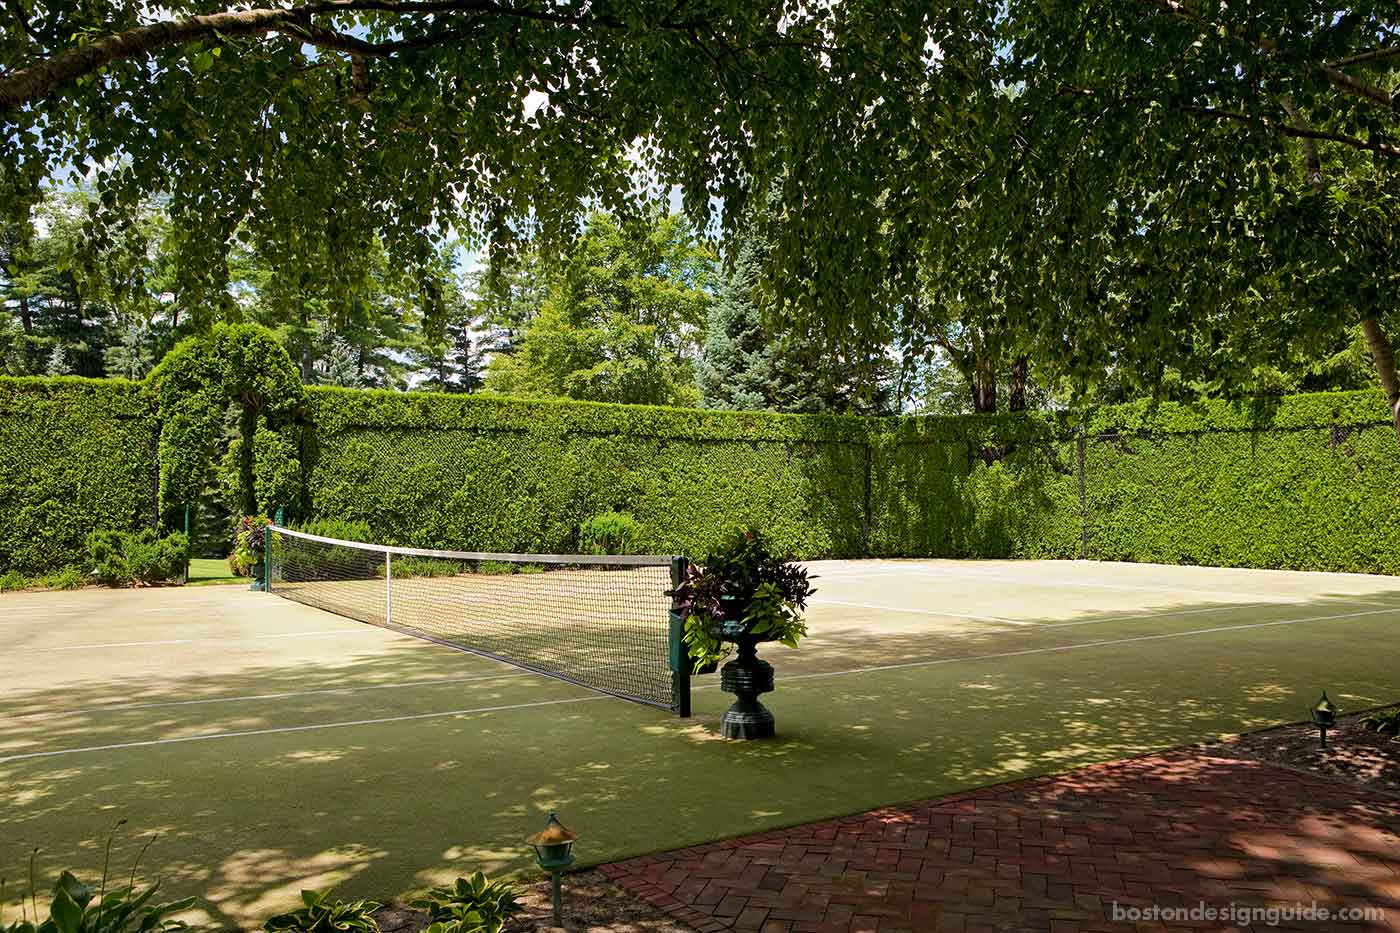 Grass tennis court designed by Sudbury Design Group